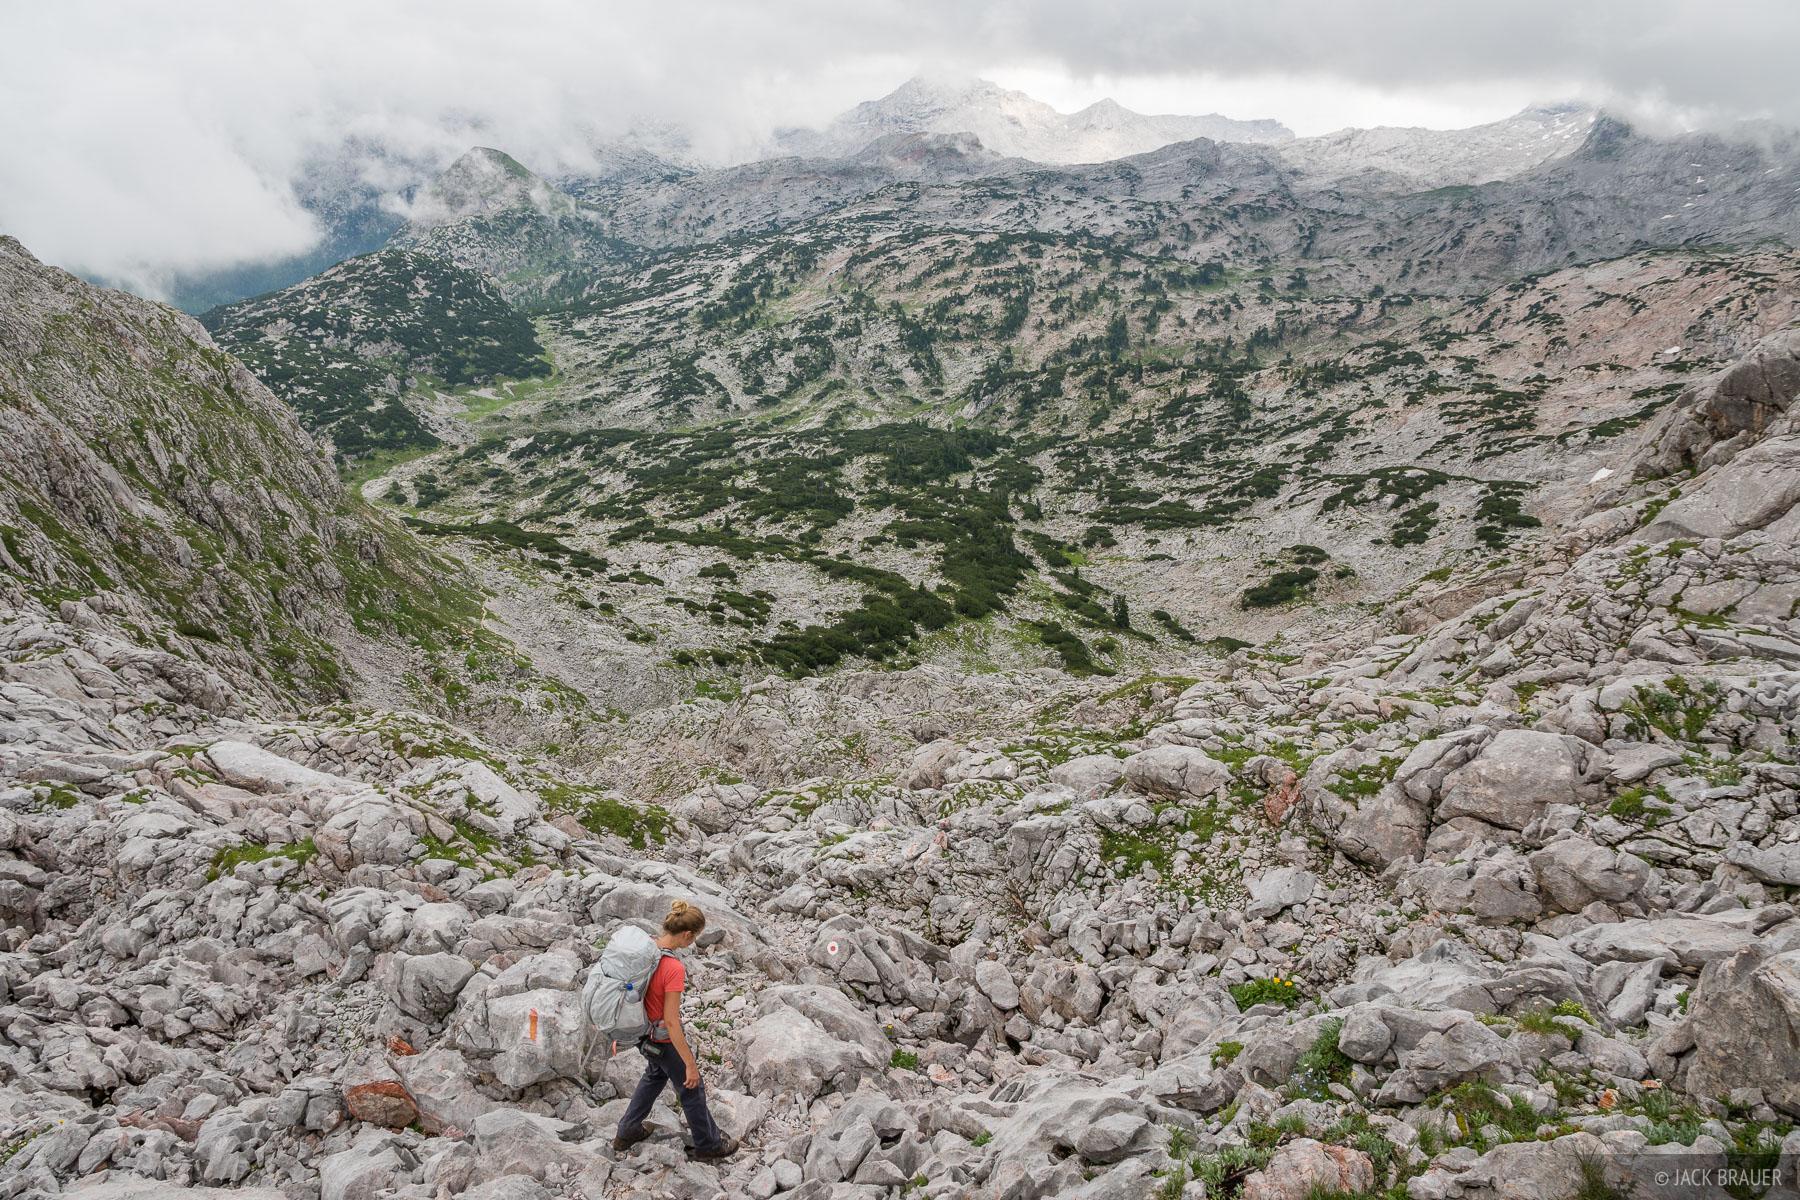 Berchtesgaden, Europe, Germany, photo